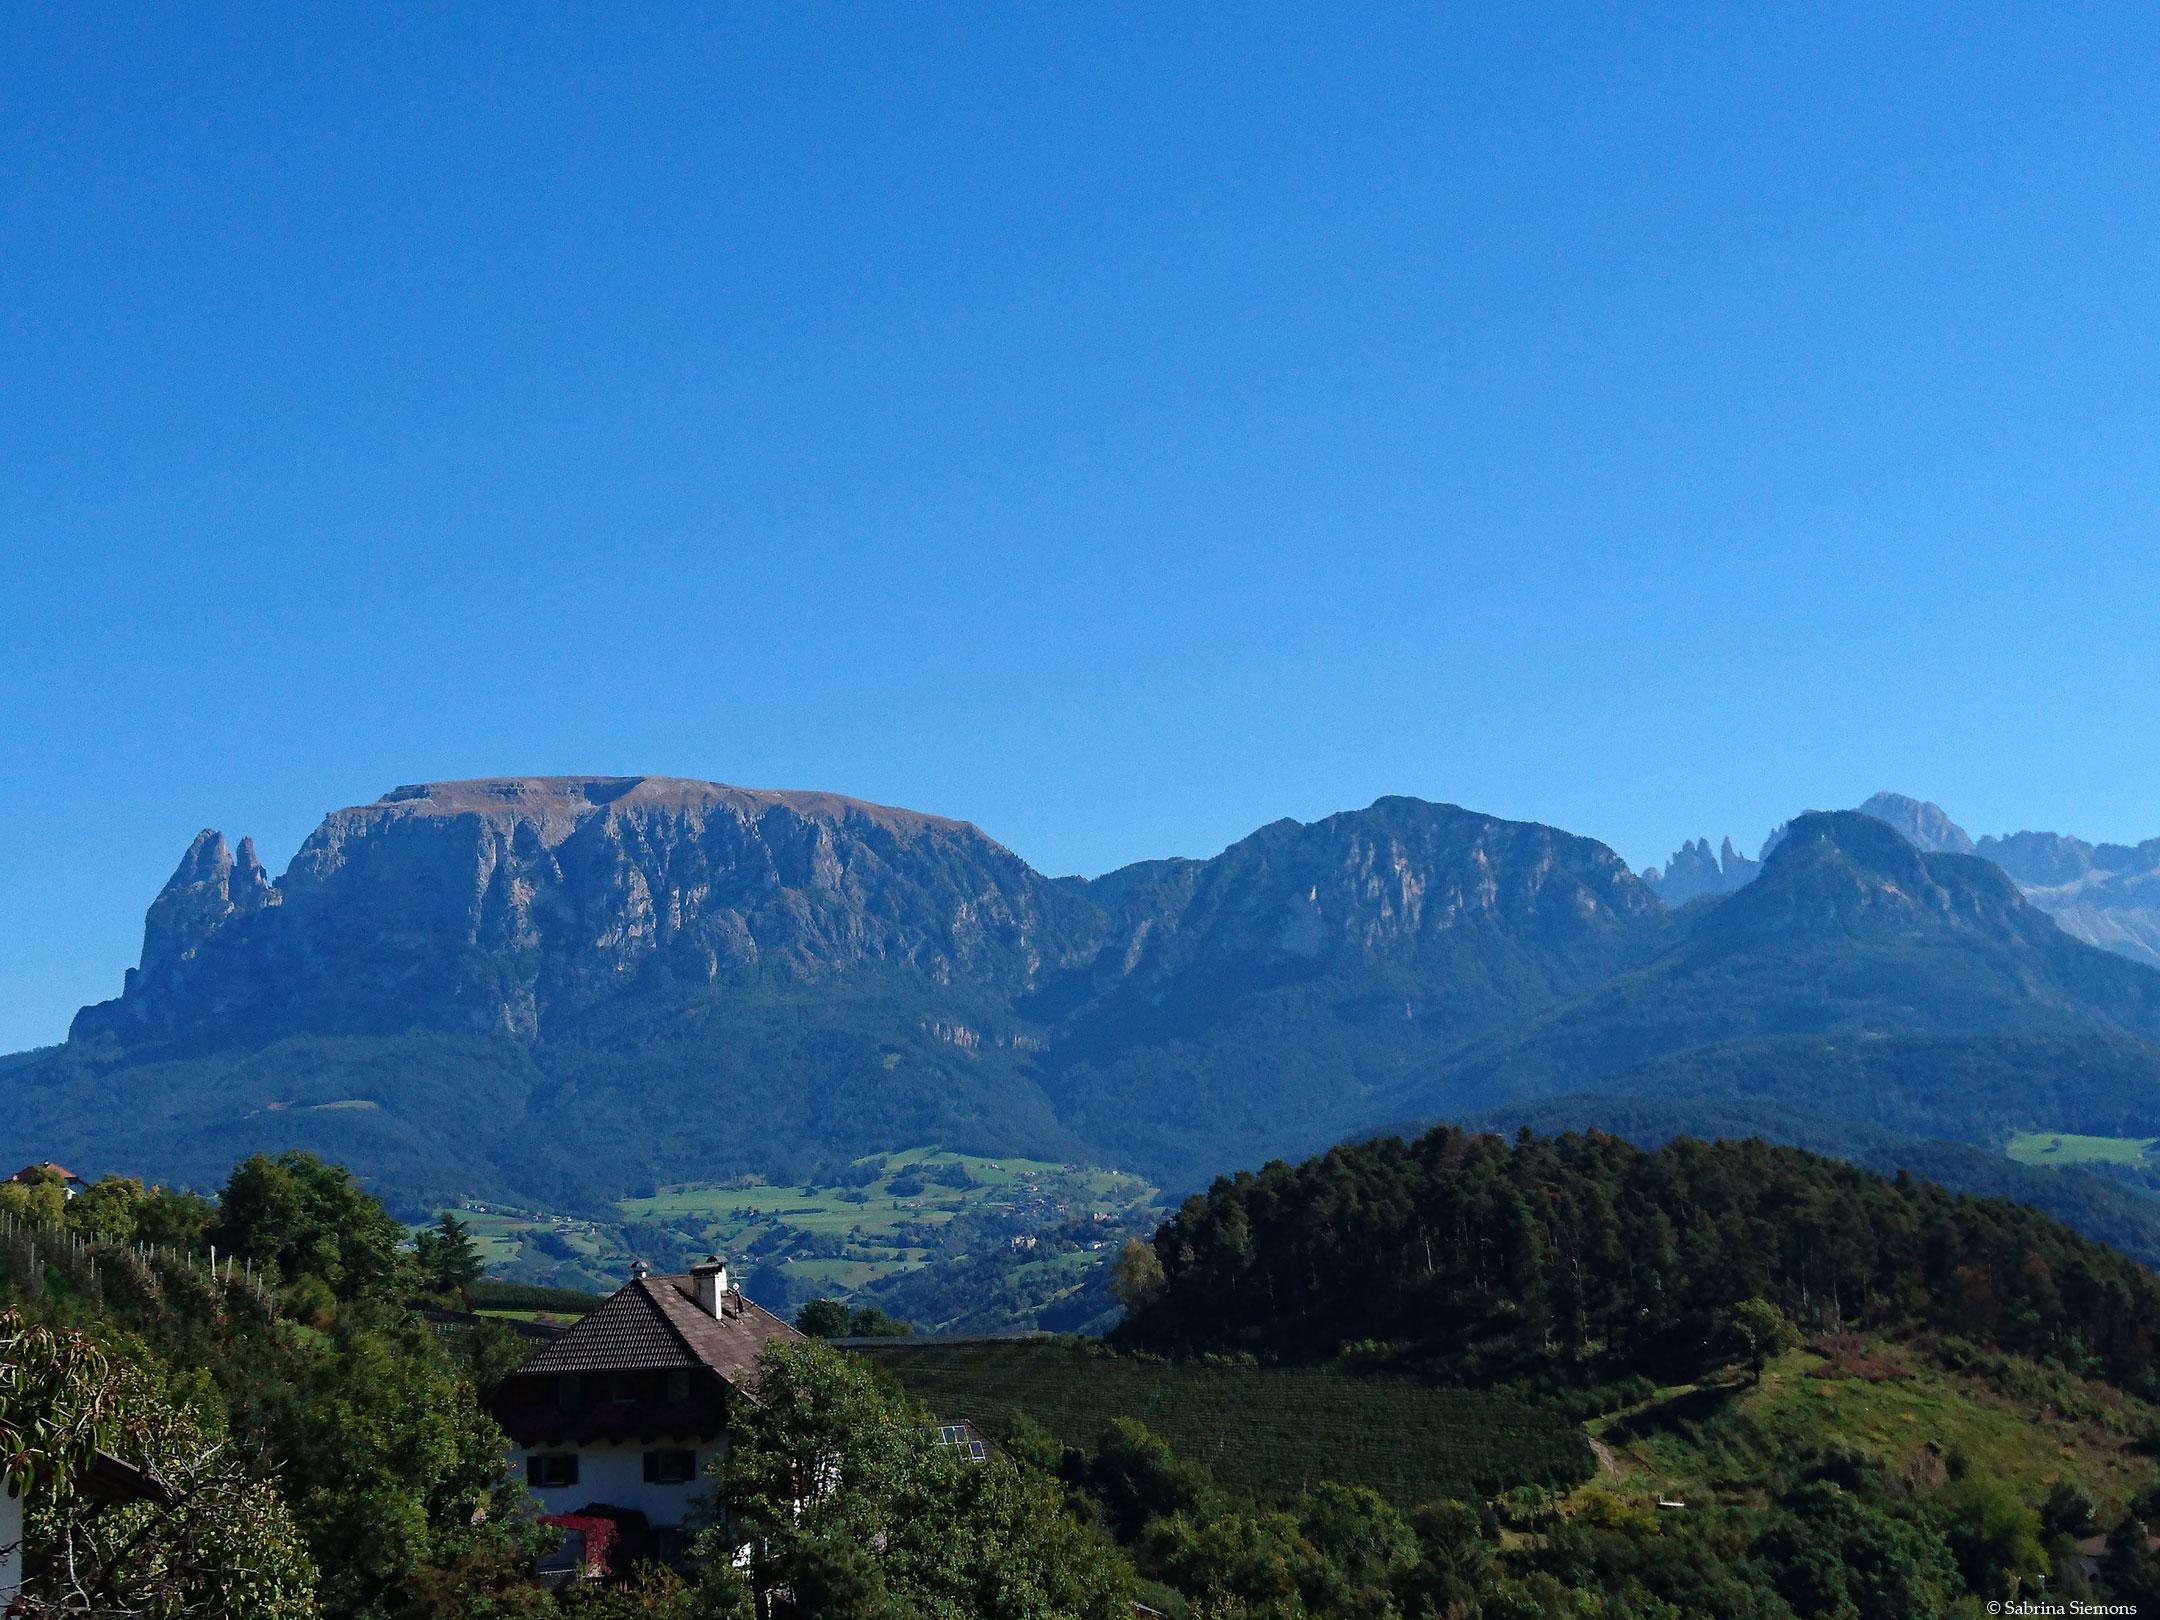 Wheelchair-Tours-Wheelchair-Rittner-Horn-View-of-Dolomites